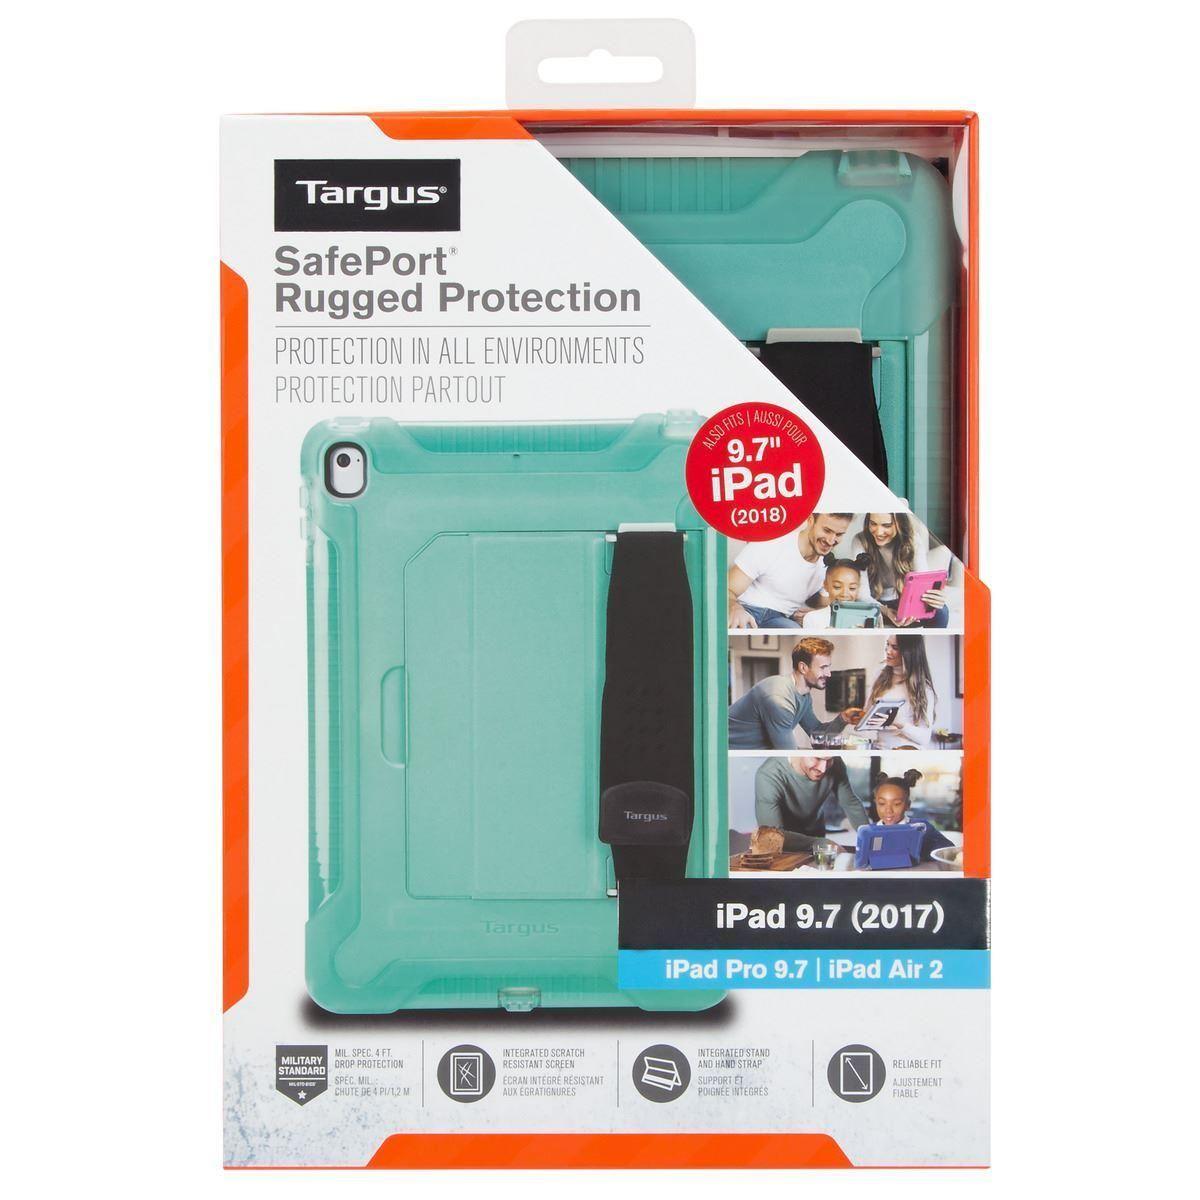 Targus SafePort Rugged Tablet Case (Teal) for Apple iPad (2018/2017)/iPad Pro (9.7 inch)/iPad Air 2 (9.7 inch)